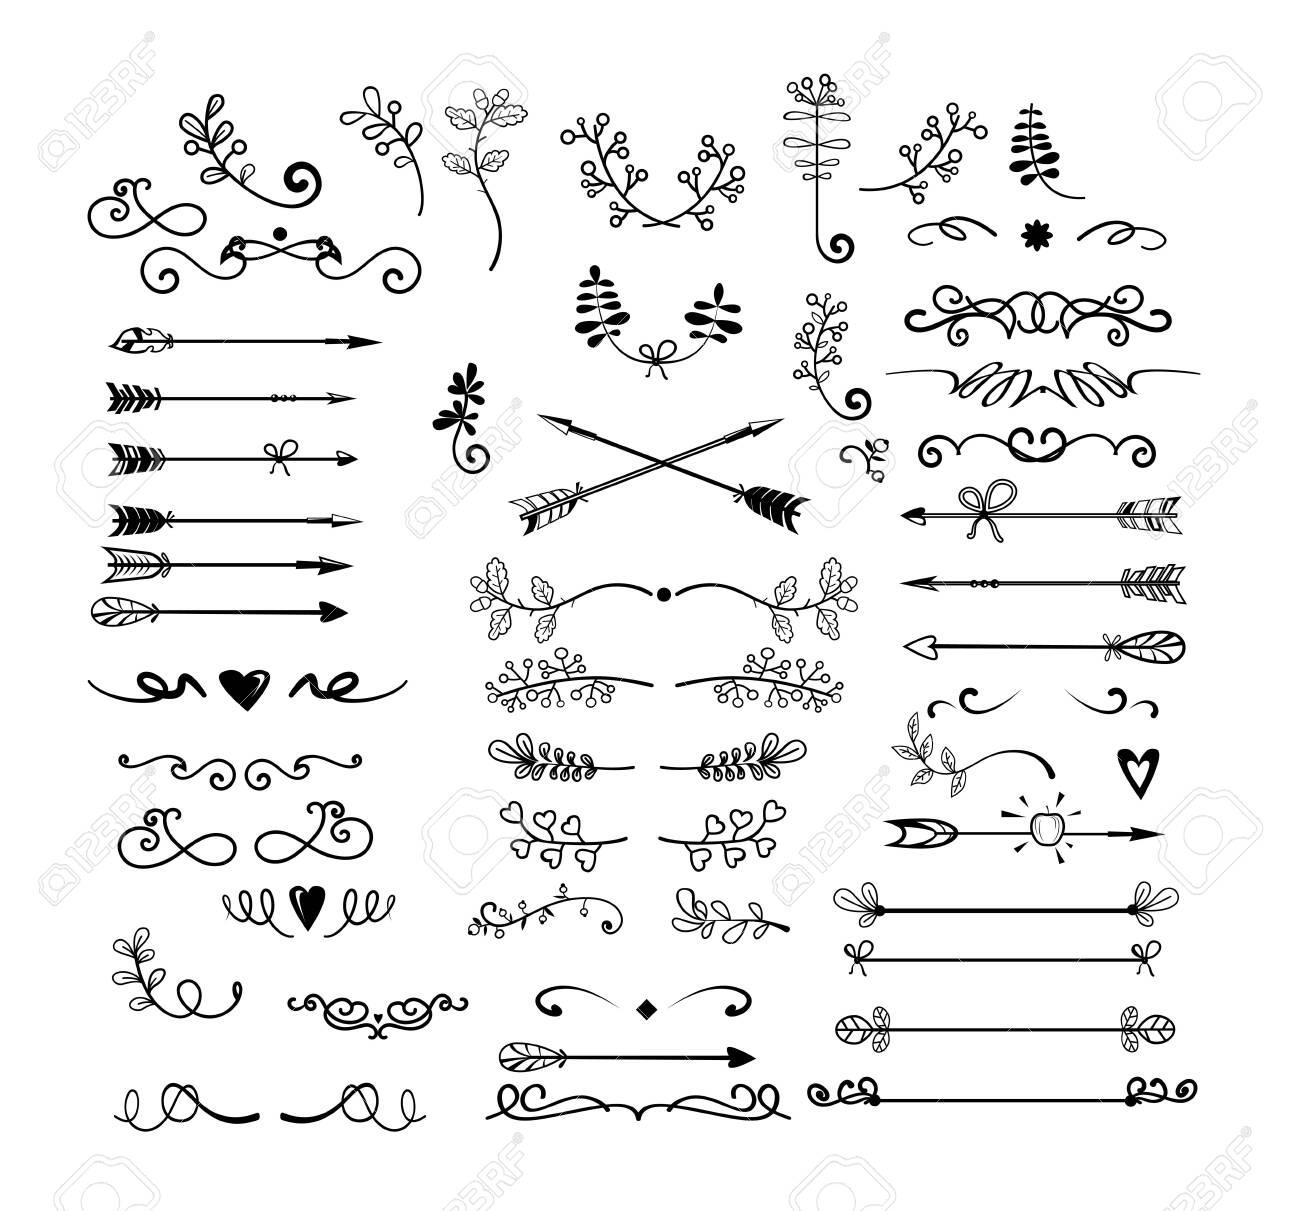 Vintage monogram set. Hand drawn doodles, arrows, antique curls, sketches. Decoration concept. Cartoon blast vector illustrations can be used for emblems, signboards - 129085744